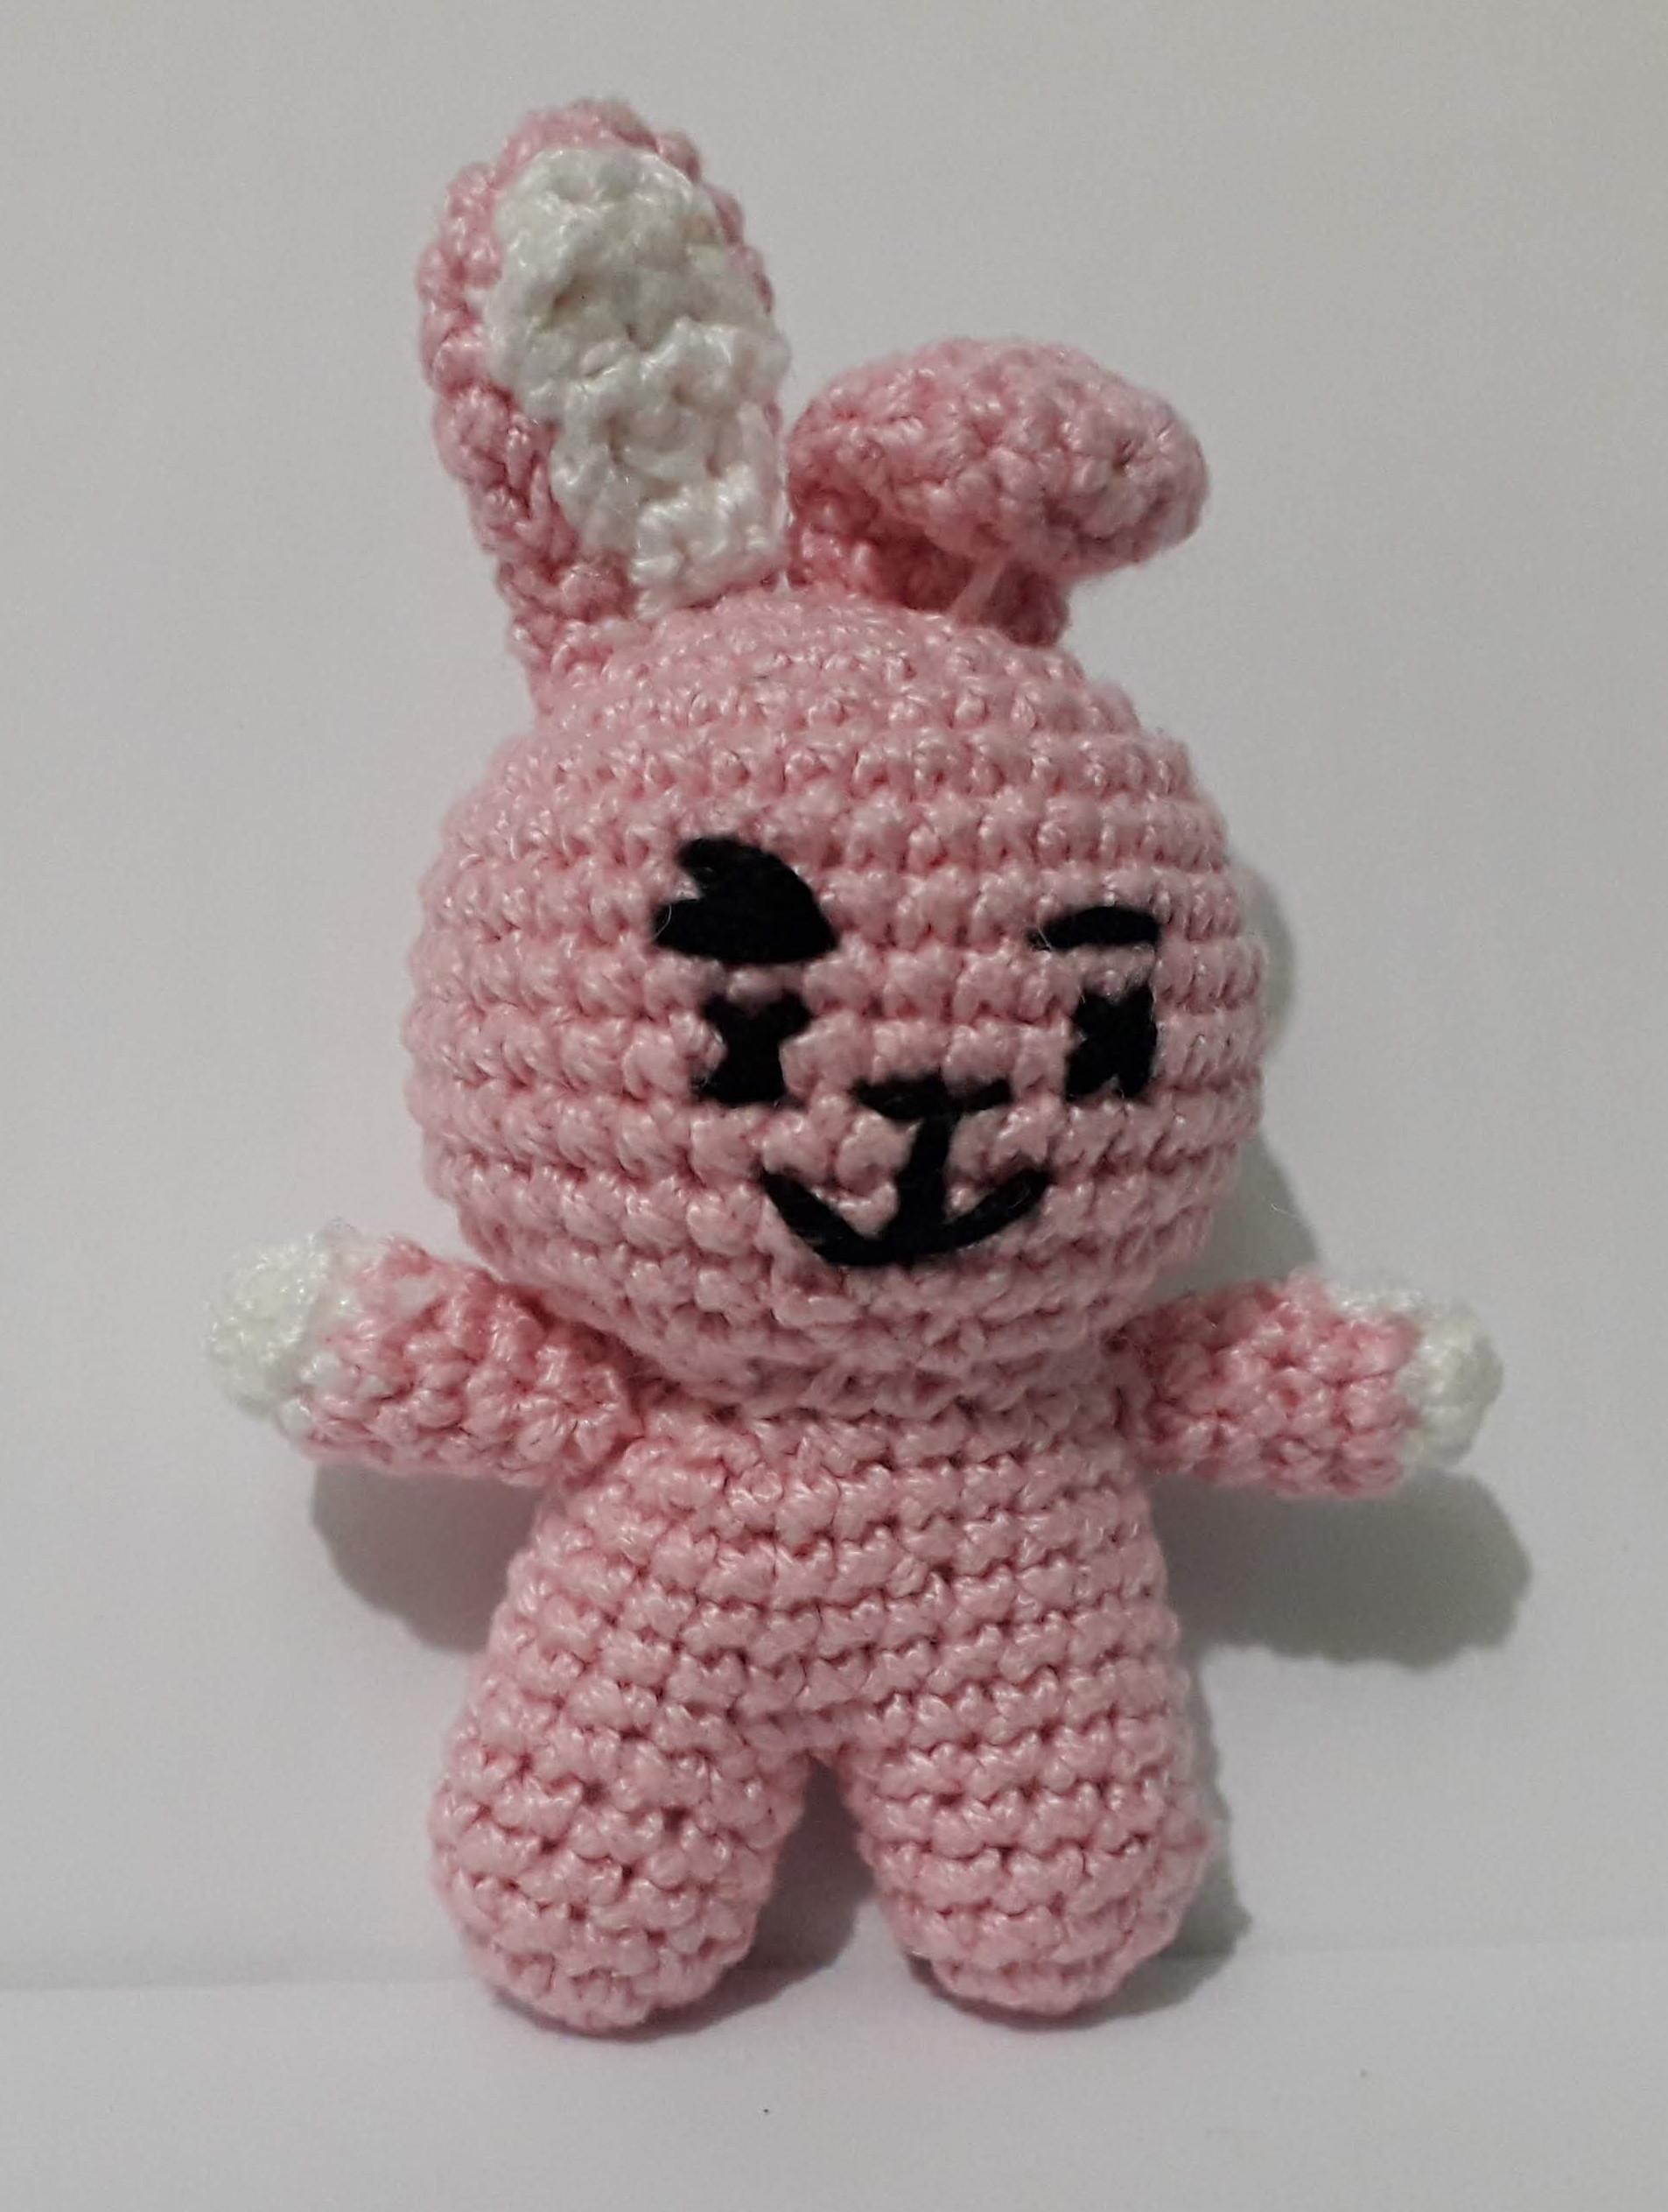 Crochet pettern Bt21 Cooky | ARMY's Amino | 2527x1906